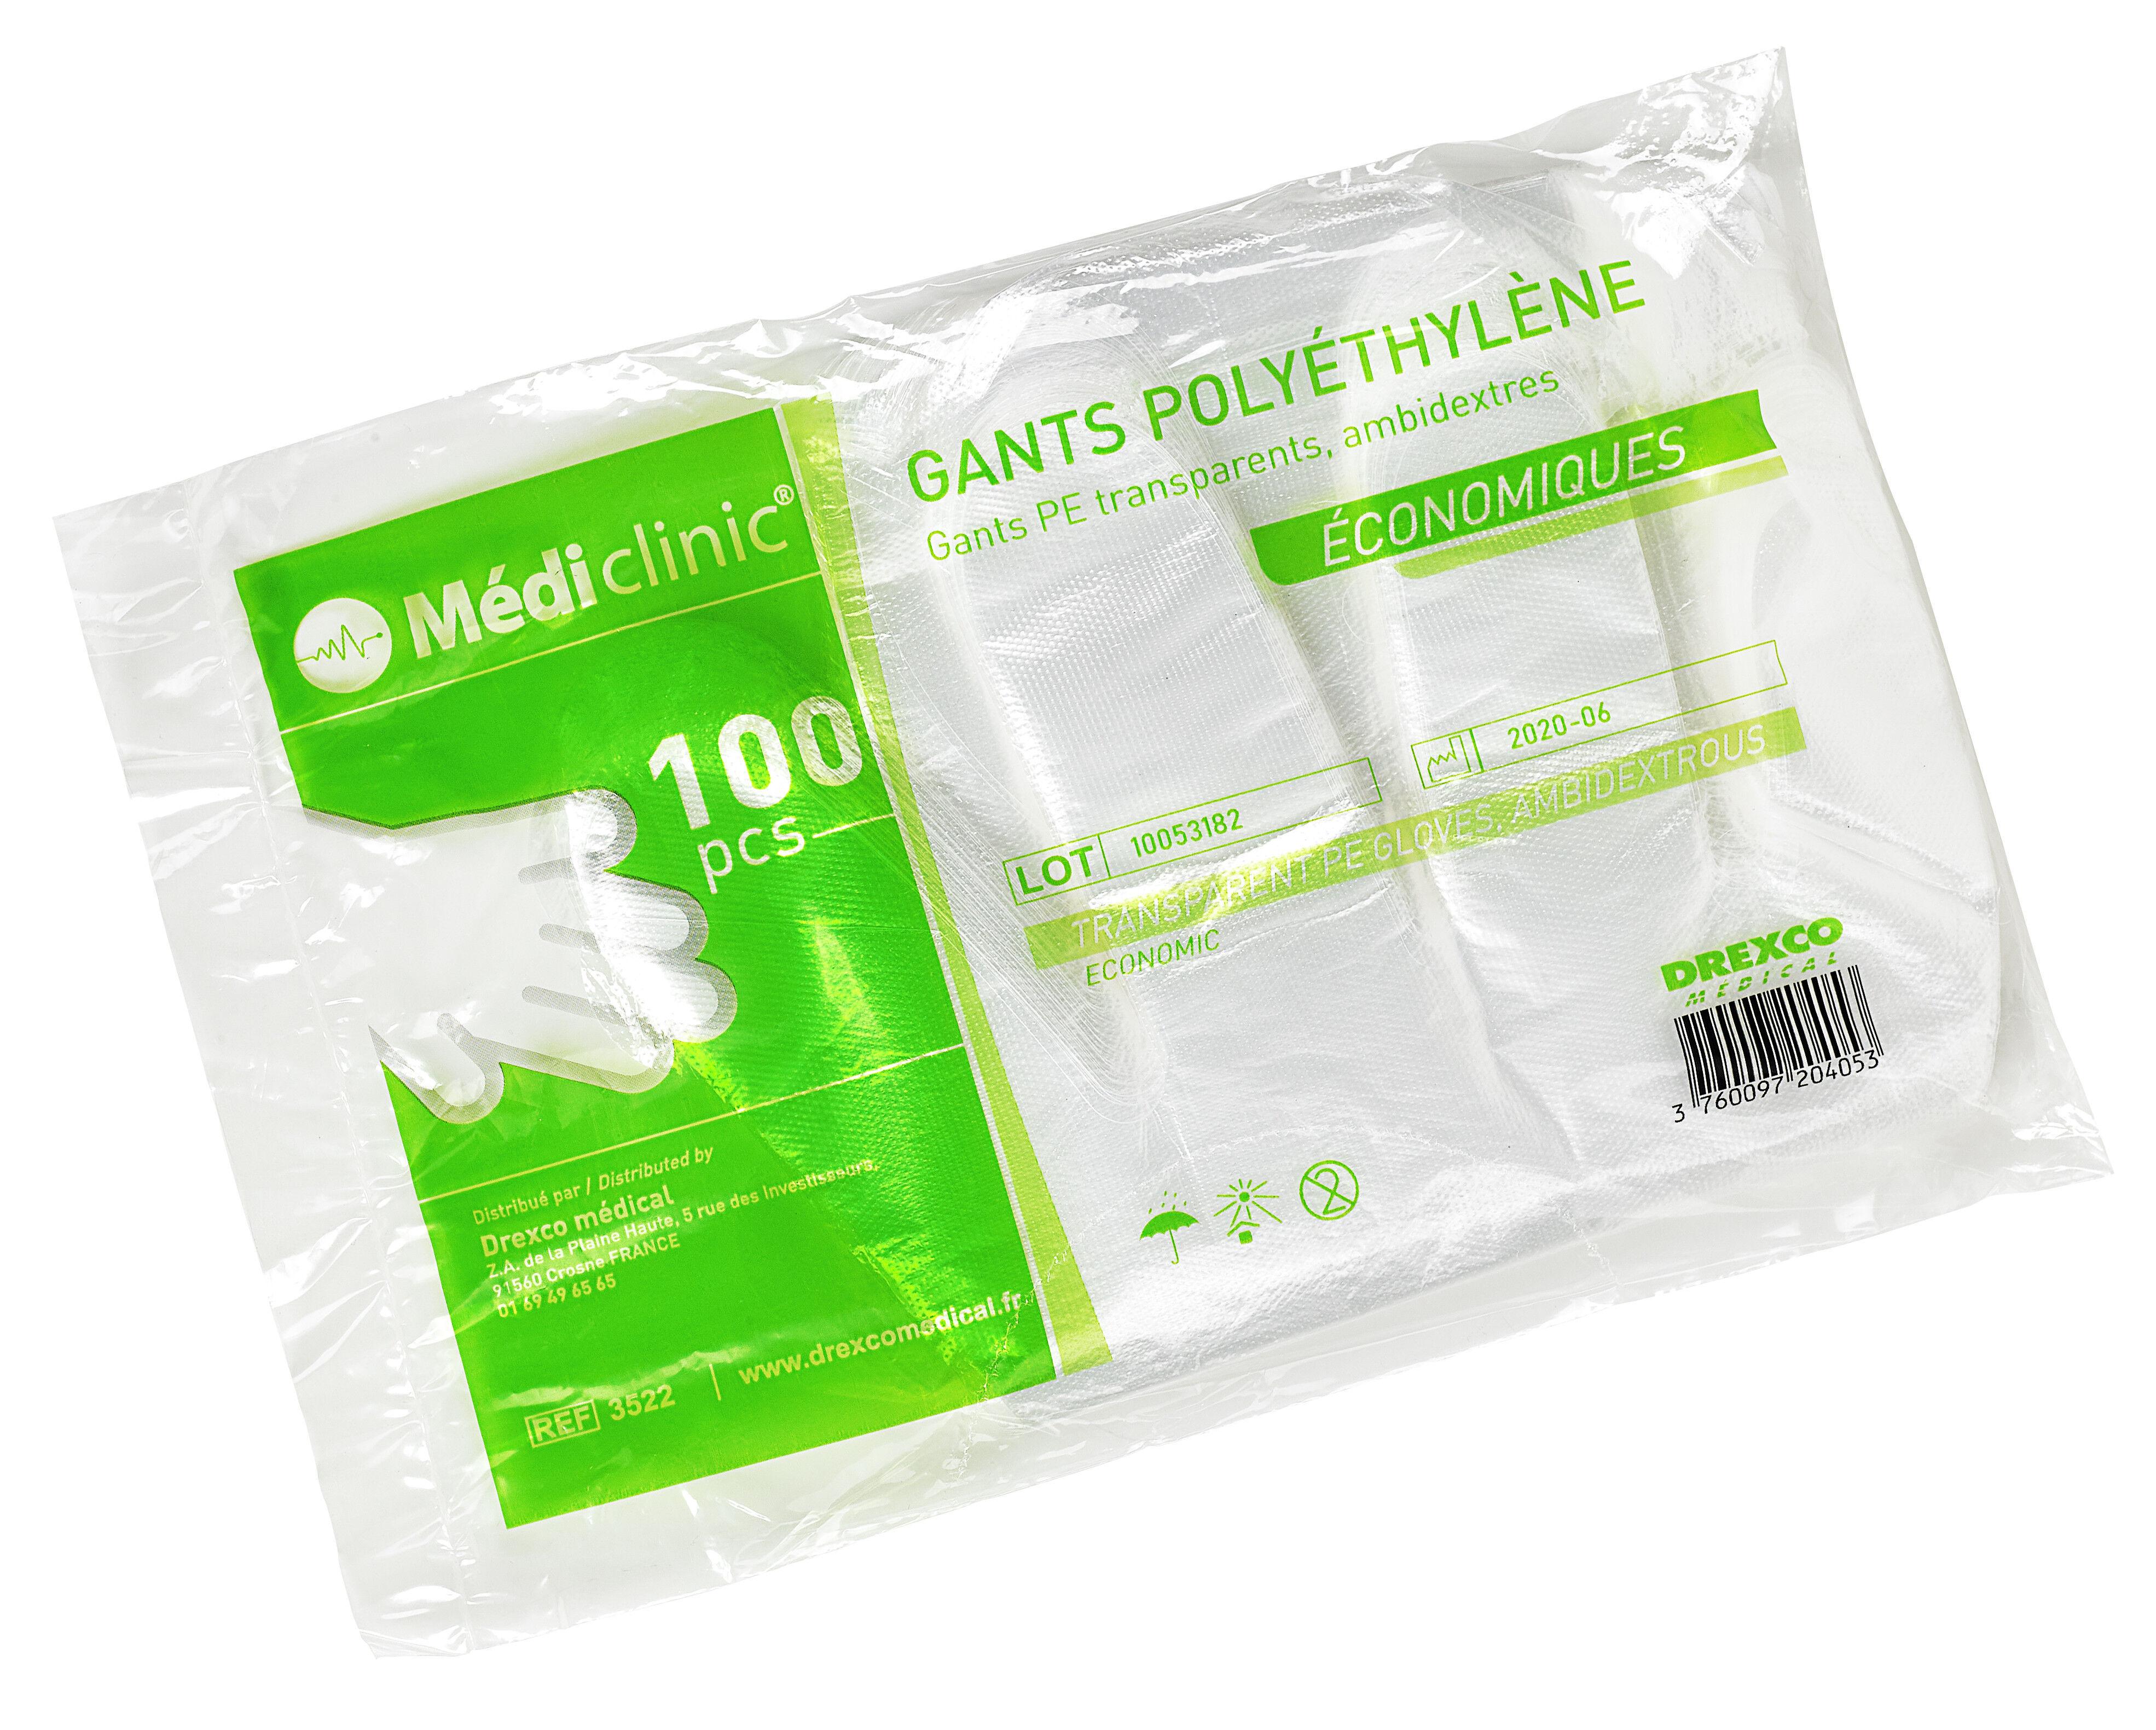 GANTS POLYÉTHYLÈNE MEDICLINIC - BOITE DE 100